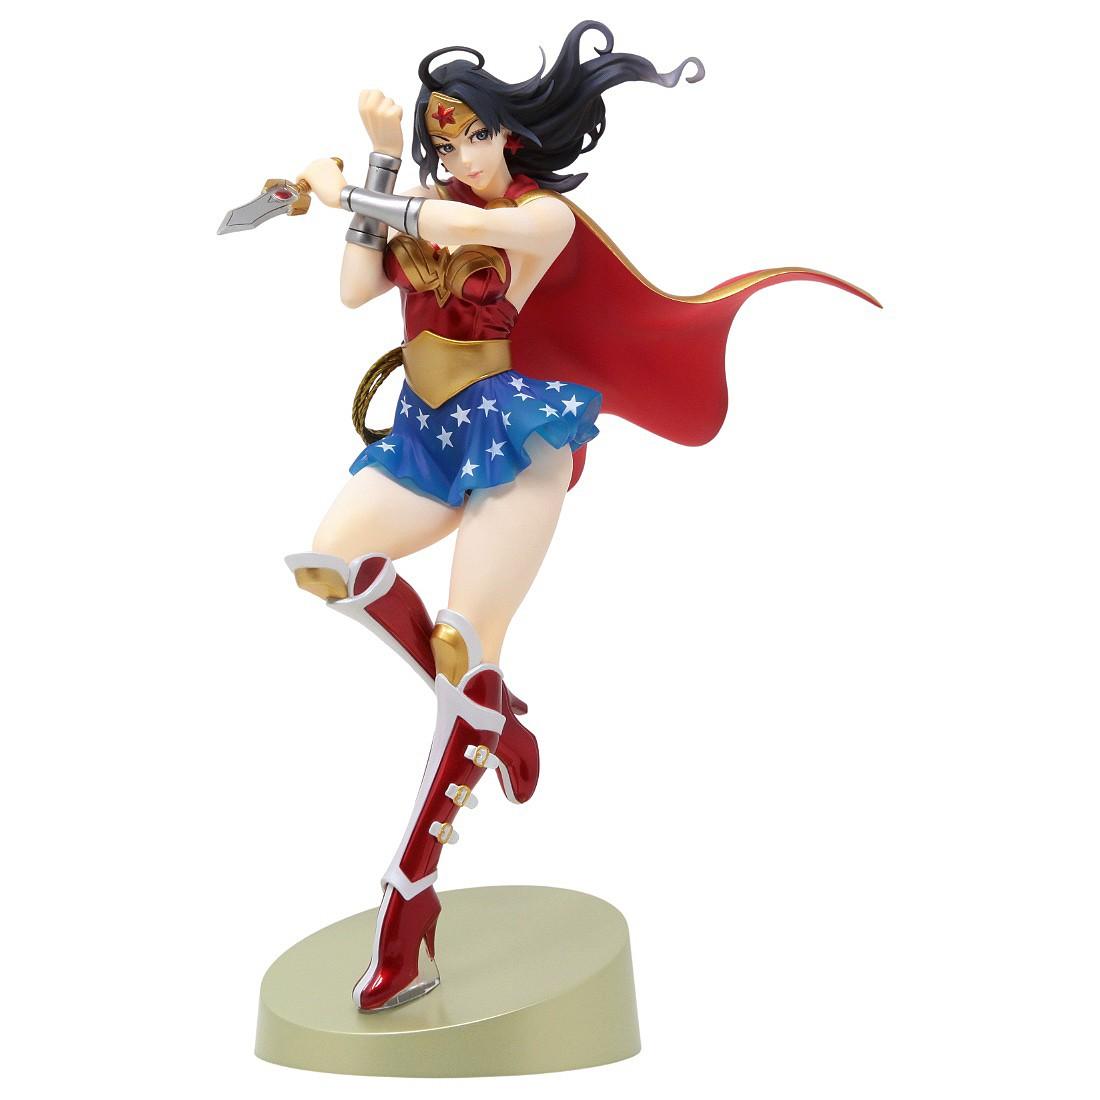 Kotobukiya Armored Wonder Woman - Mulher Maravilha - 2nd Edition Bishoujo